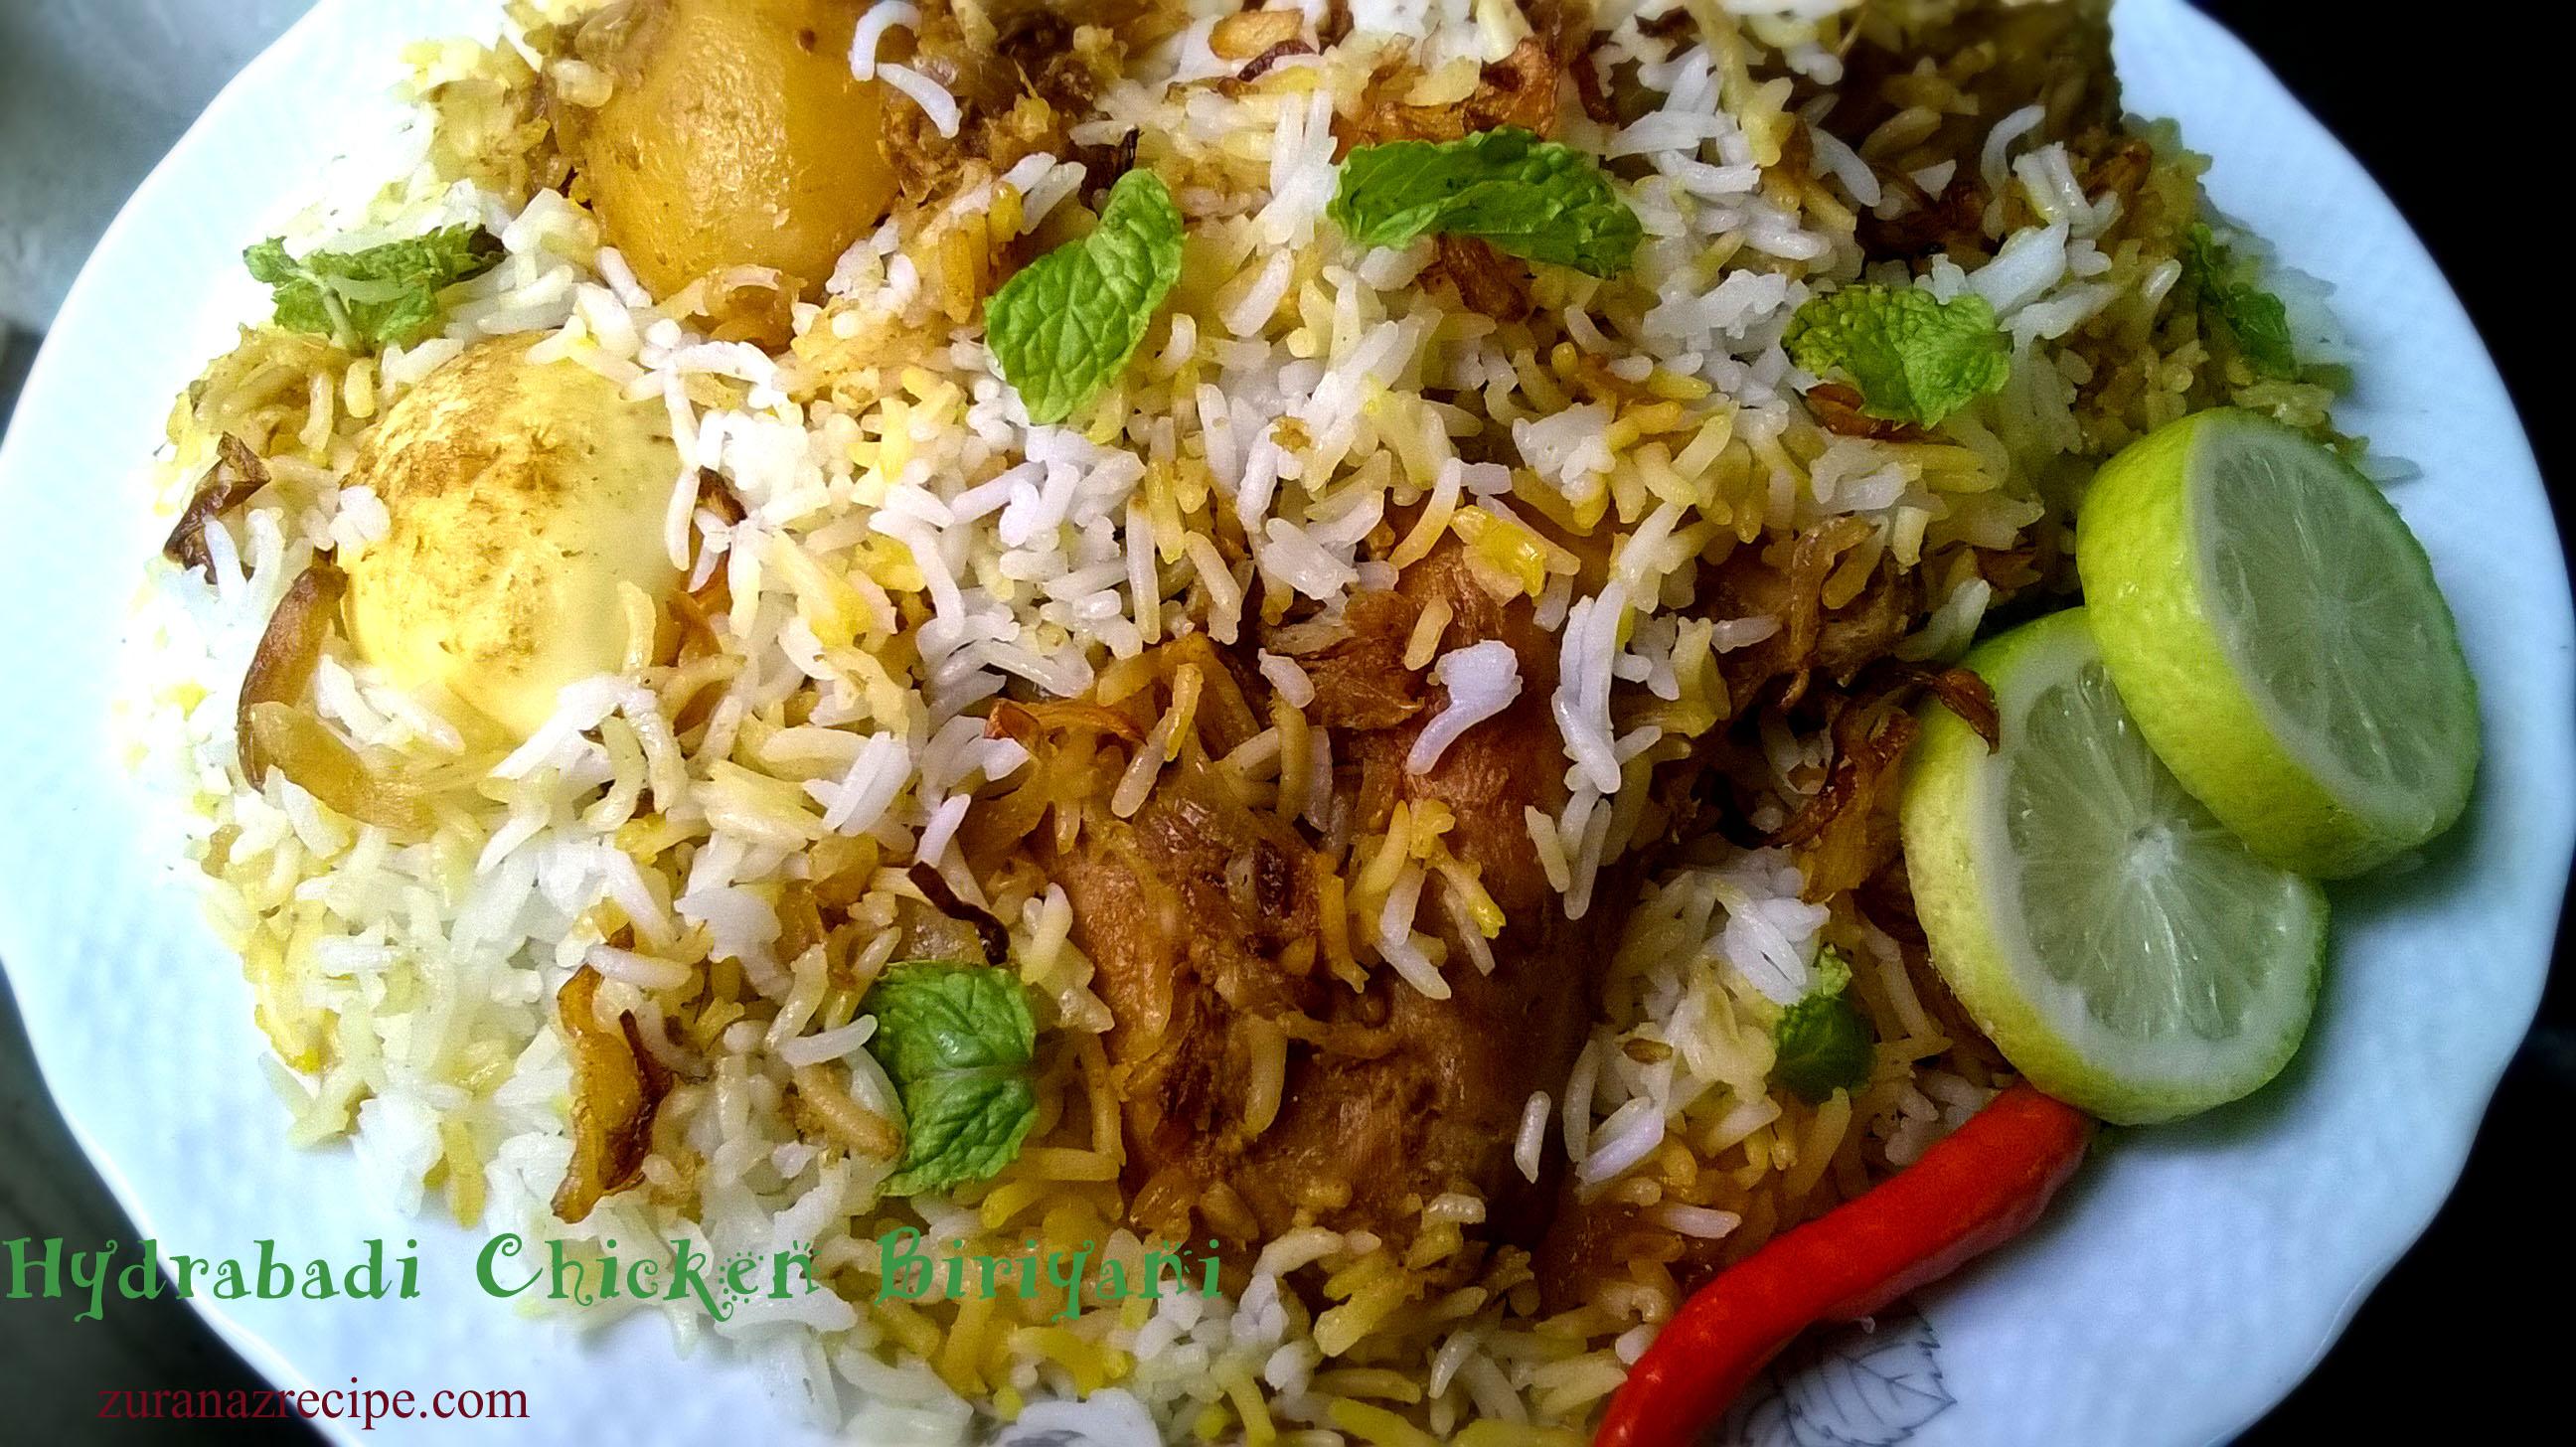 Hydrabadi chicken biriyani bangla bangladeshi bengali food recipes hydrabadi chicken biriyani forumfinder Choice Image